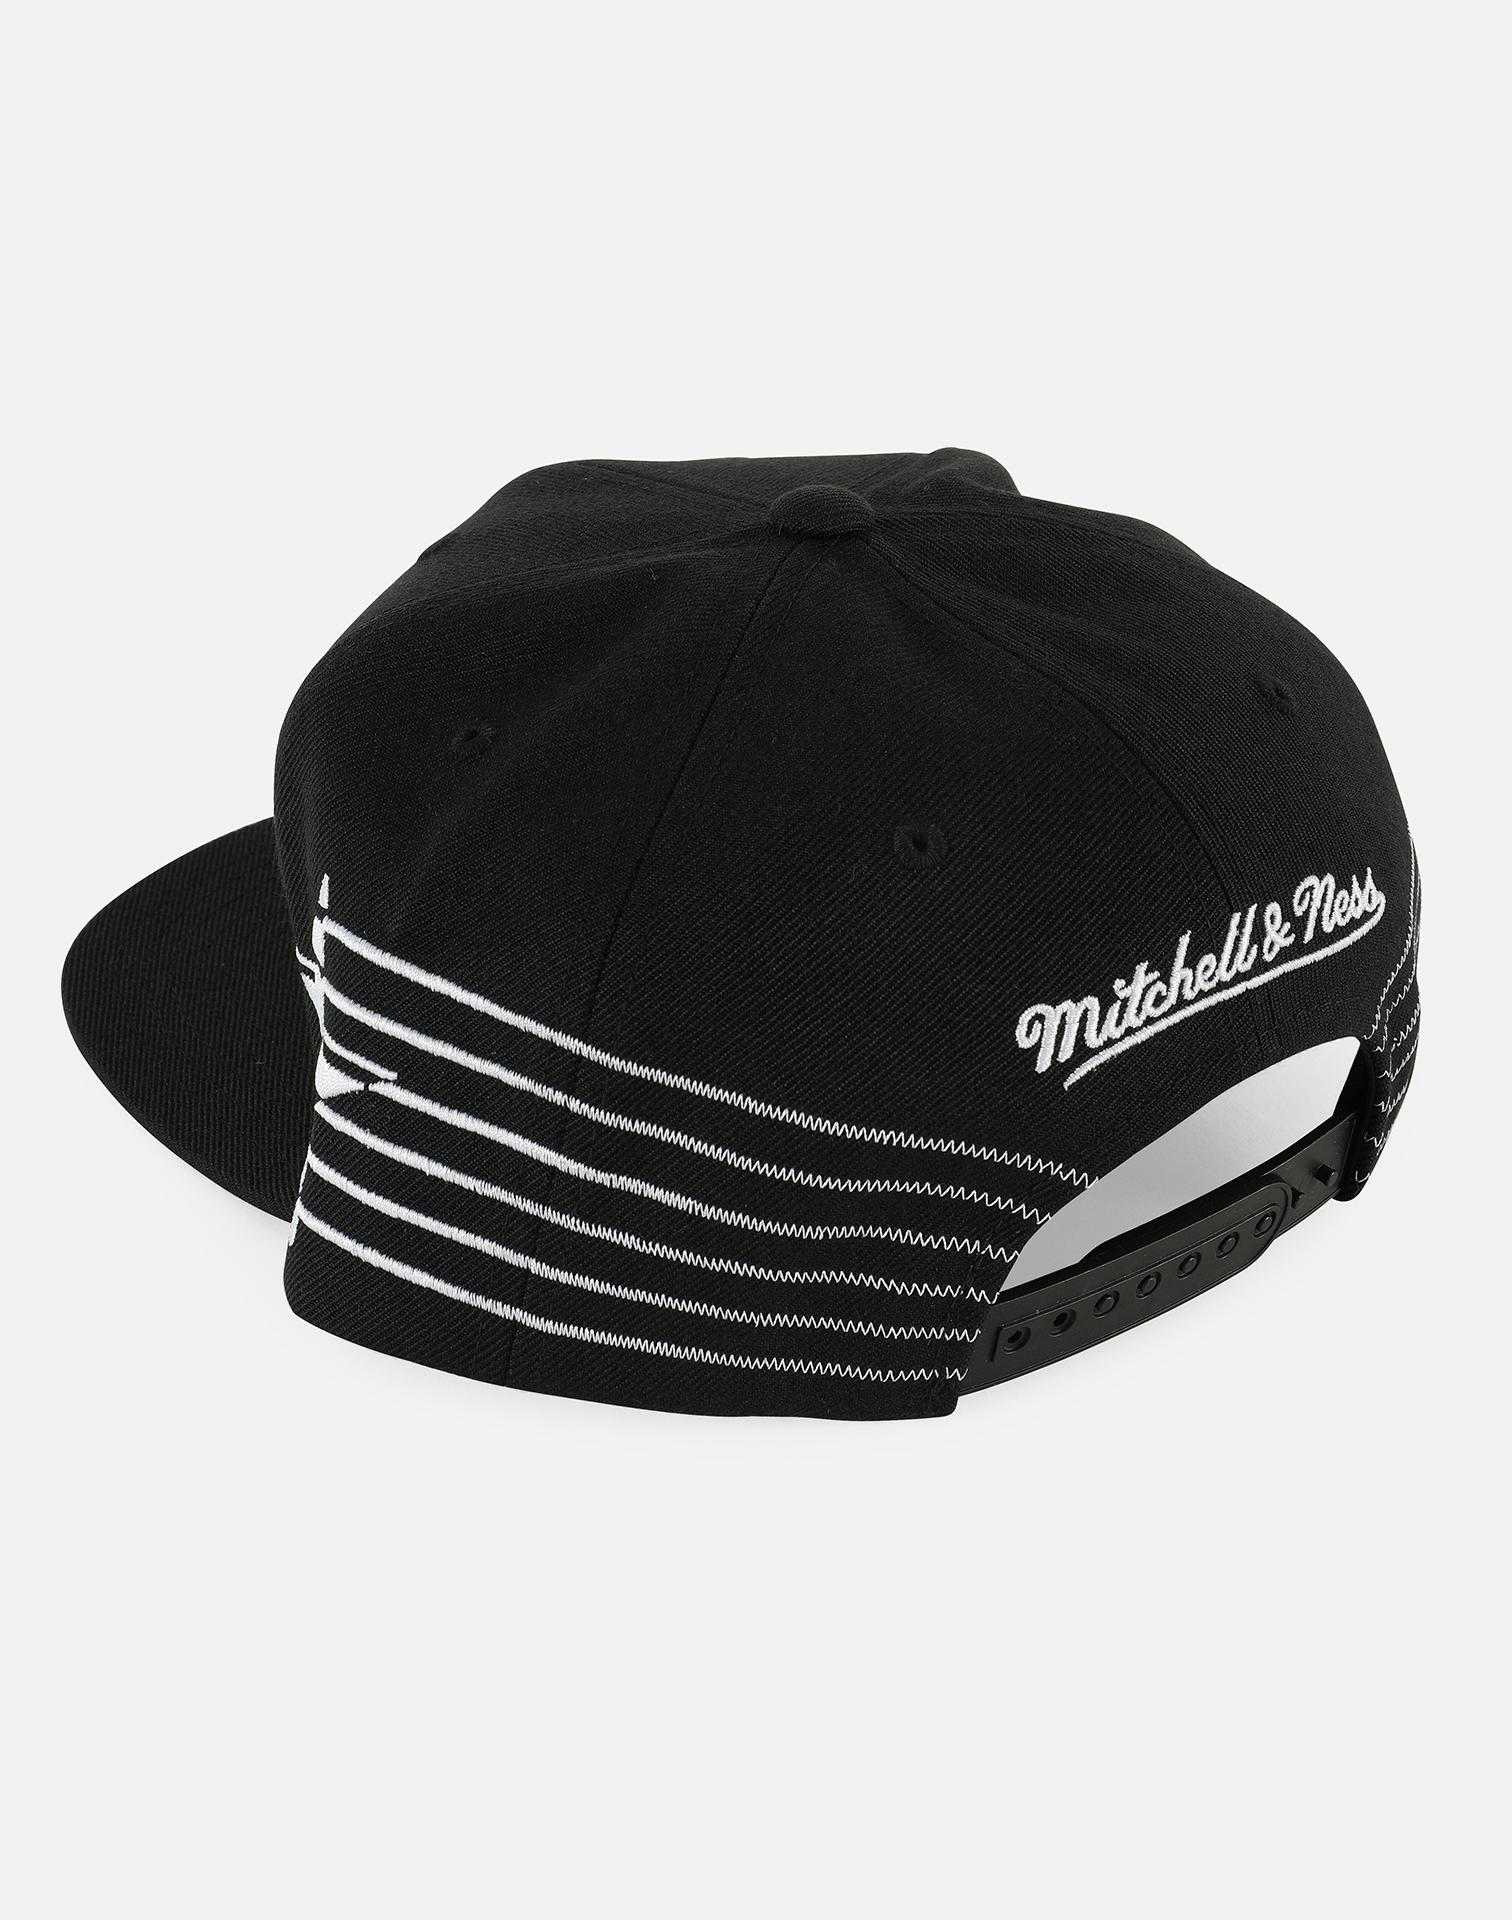 Lyst - Mitchell   Ness Nba Atlanta Hawks Racer Snapback Hat in Black ... 052ae4bc8e1f